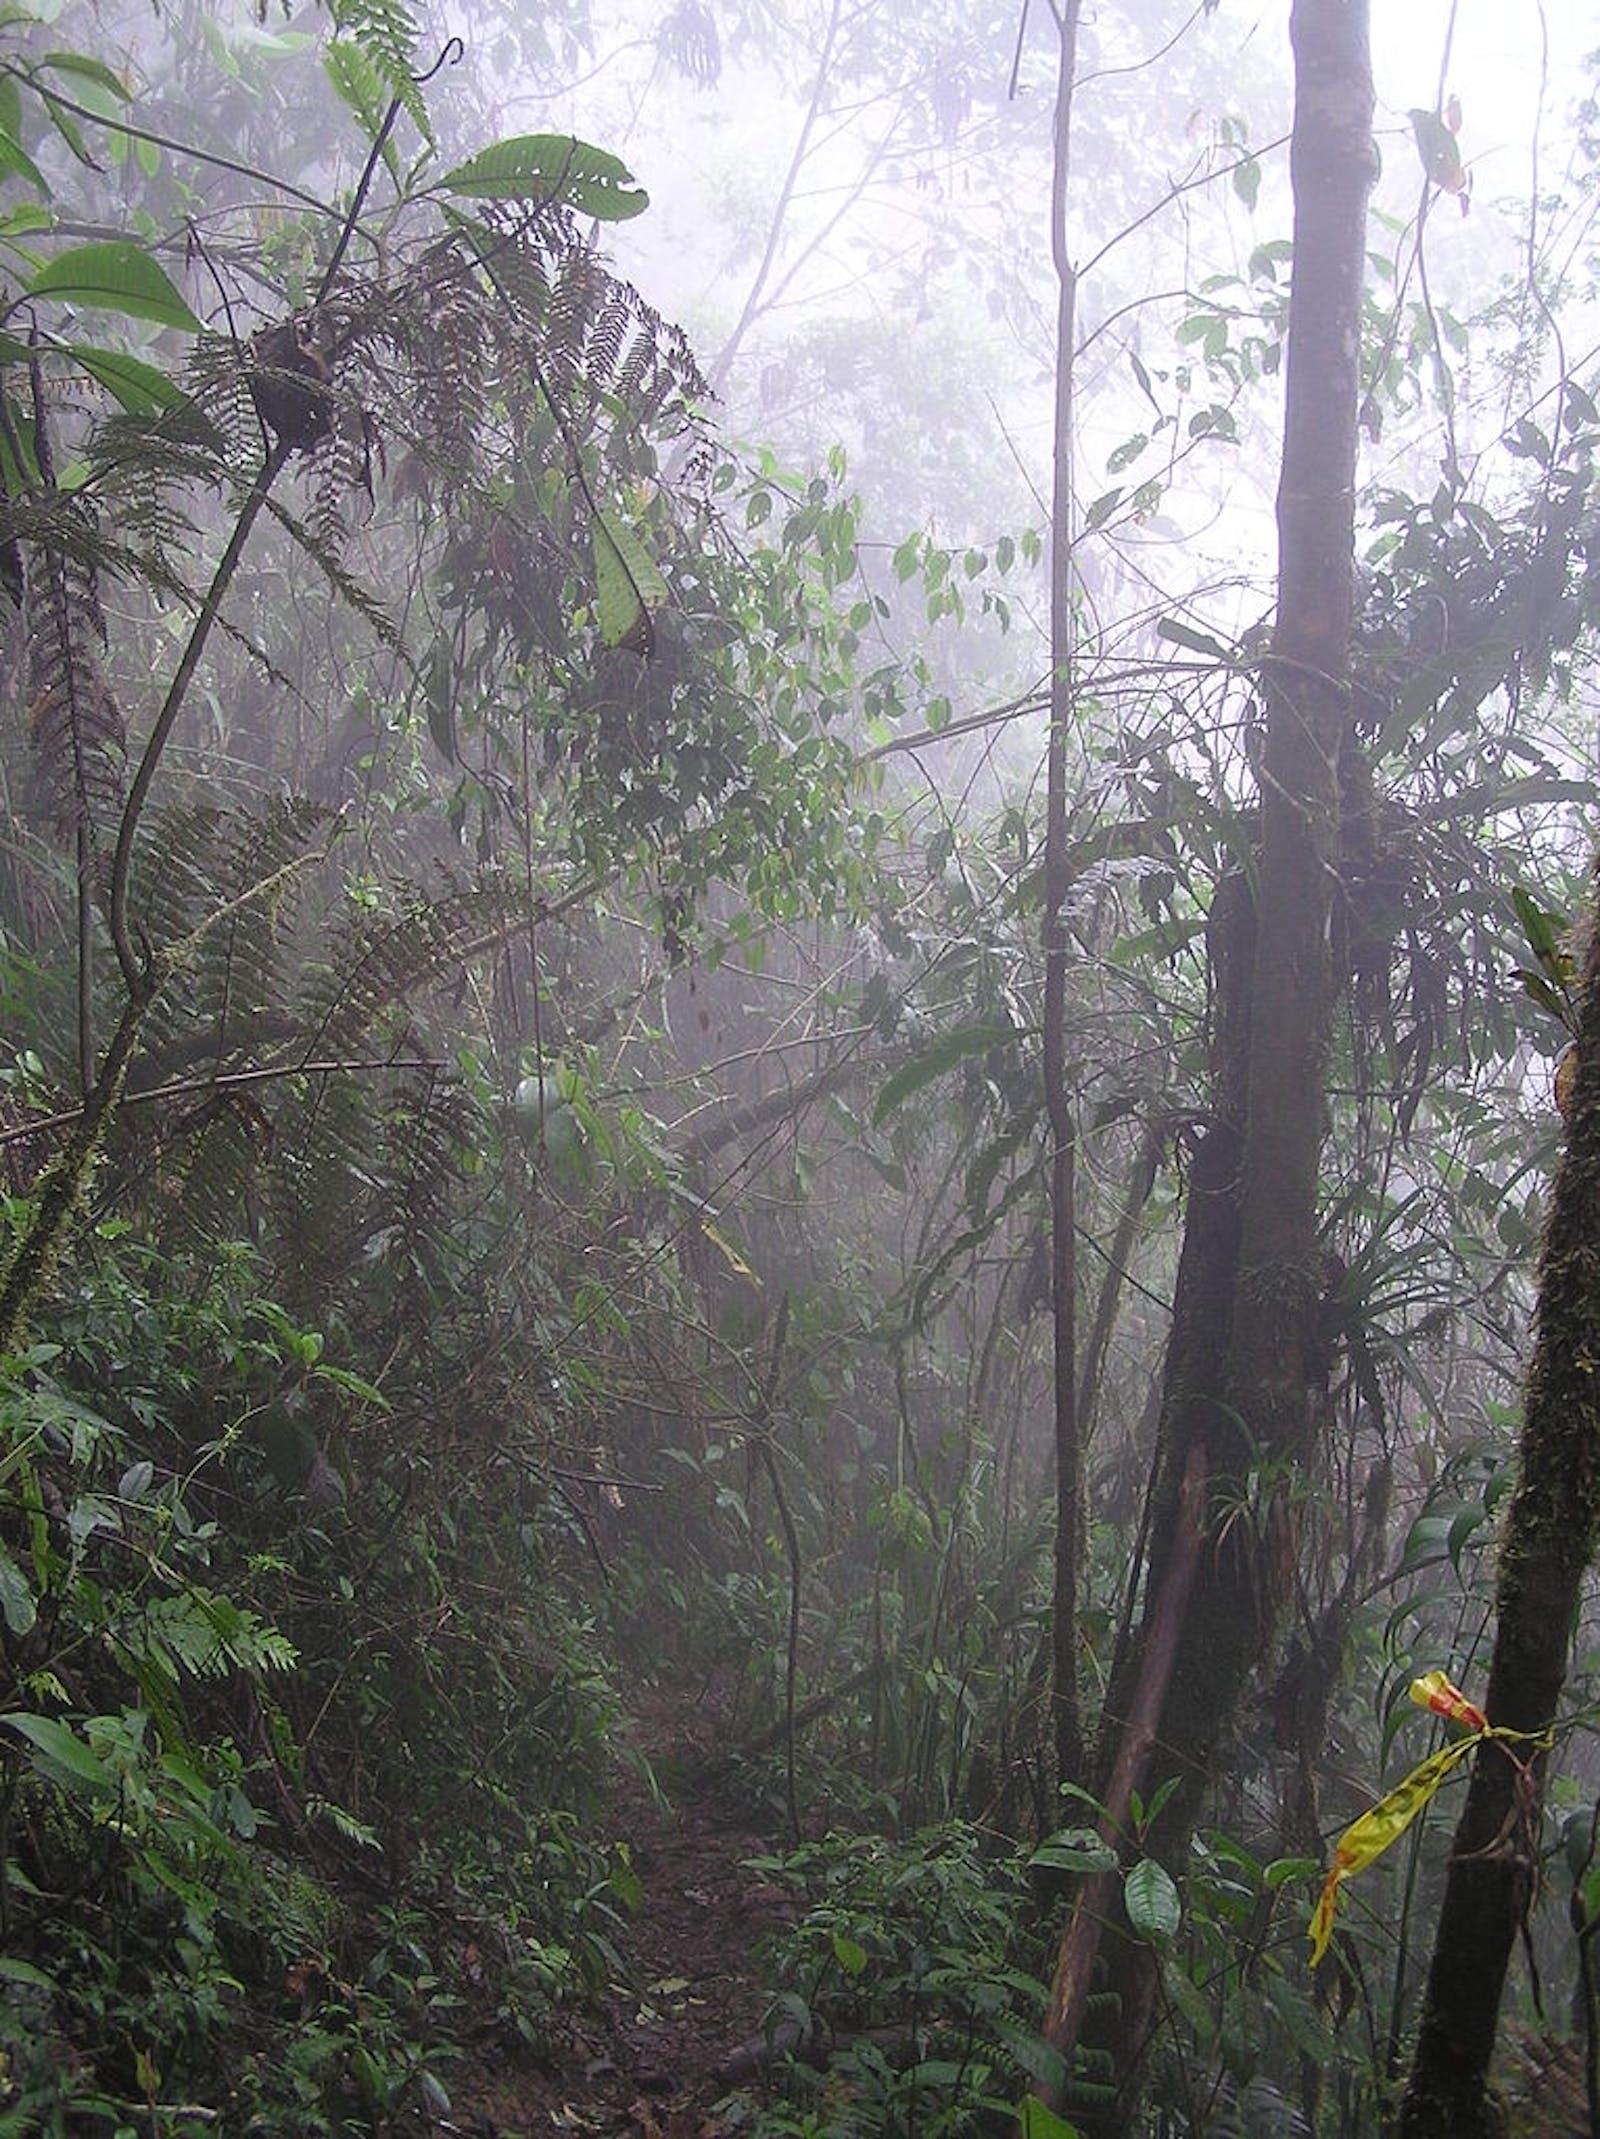 Chocó-Darién Moist Forests